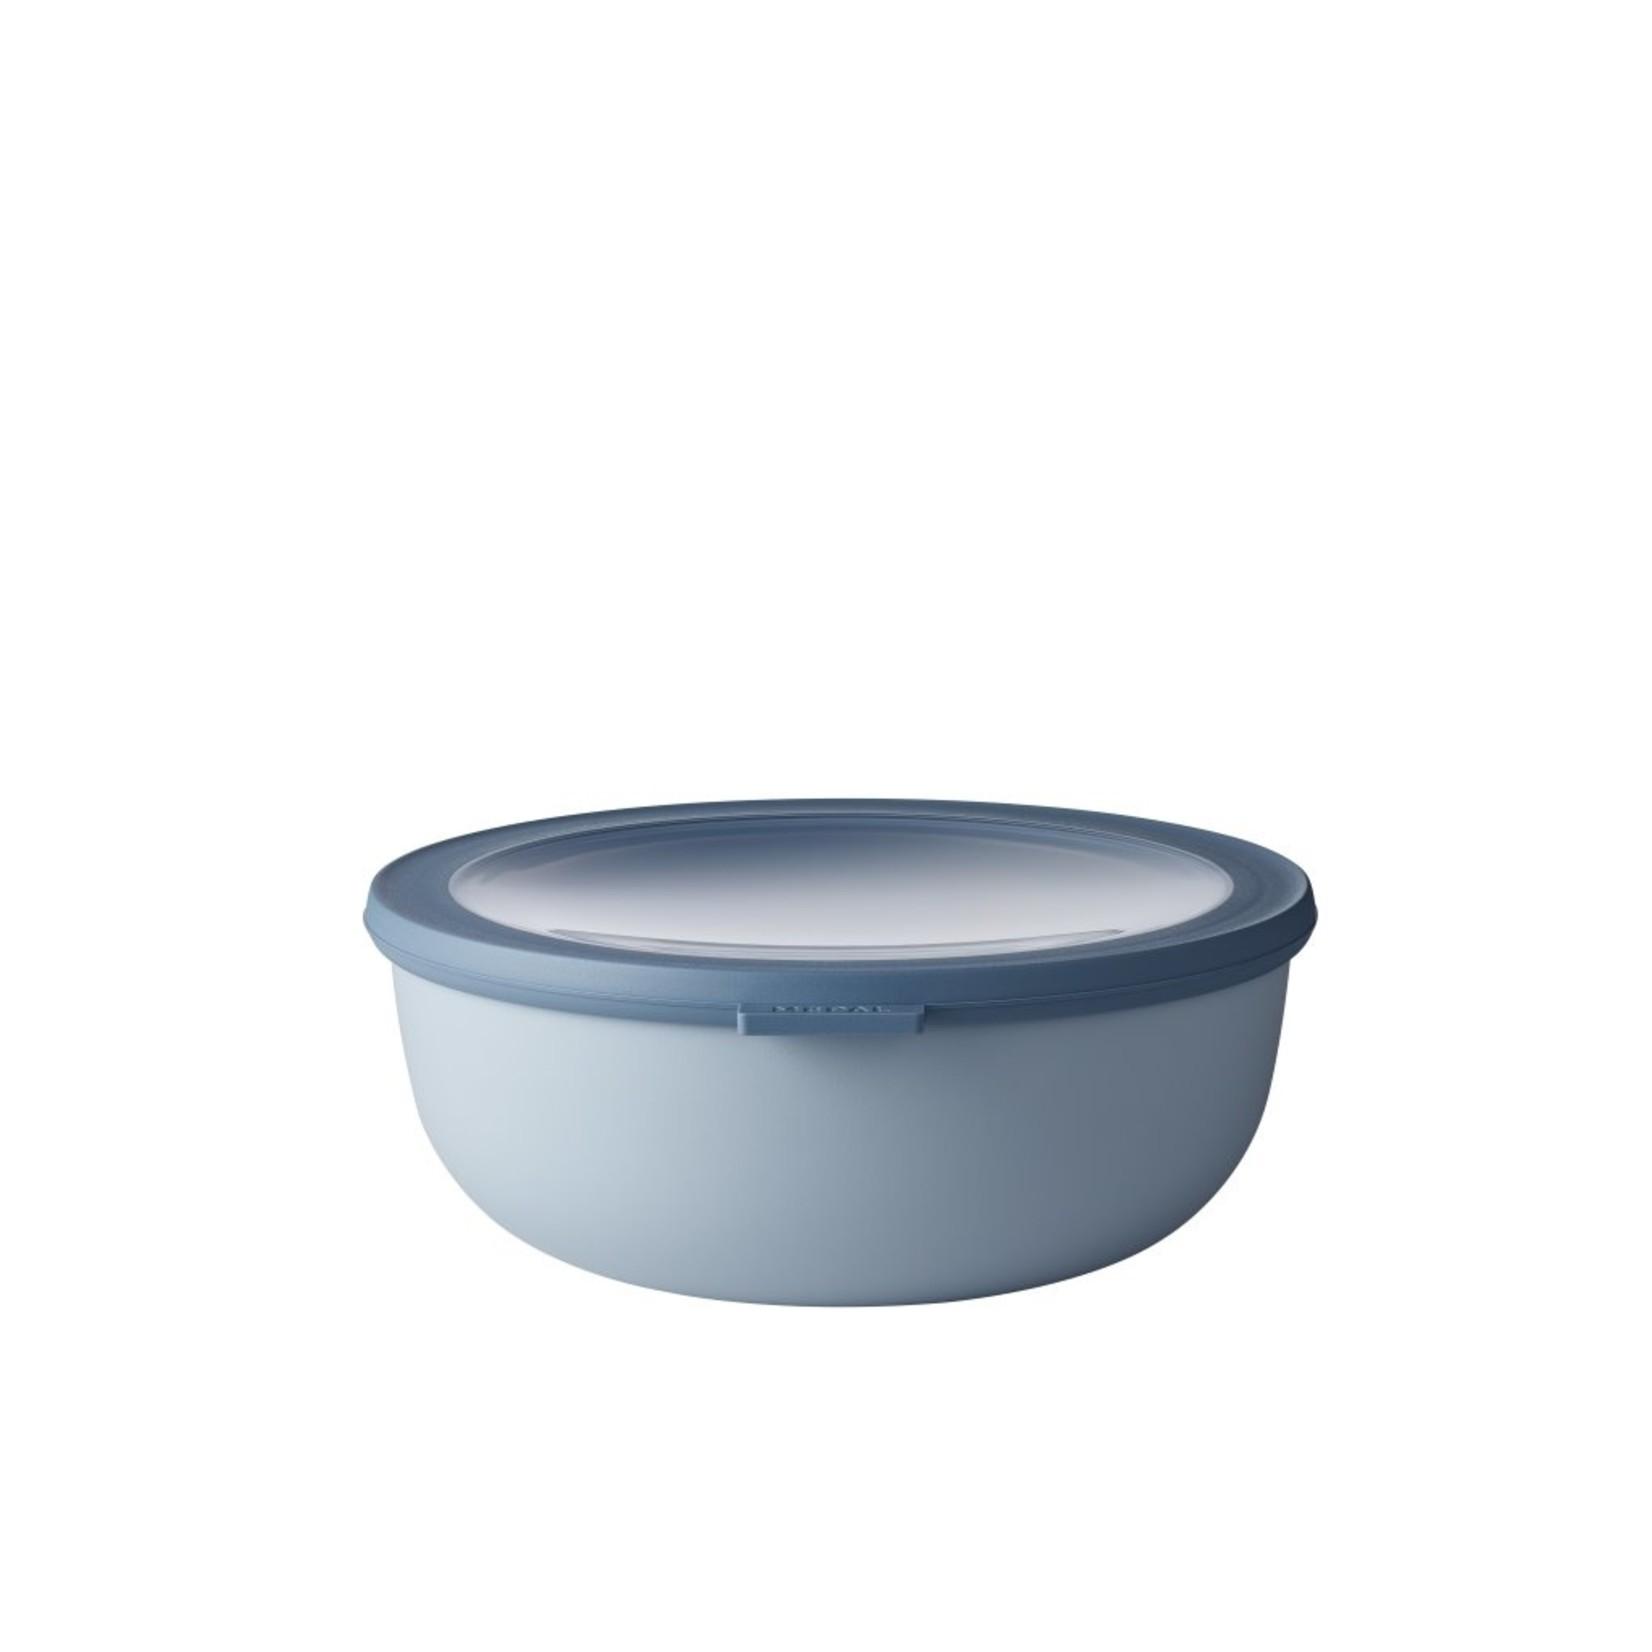 Mepal Circula Multi Bowl